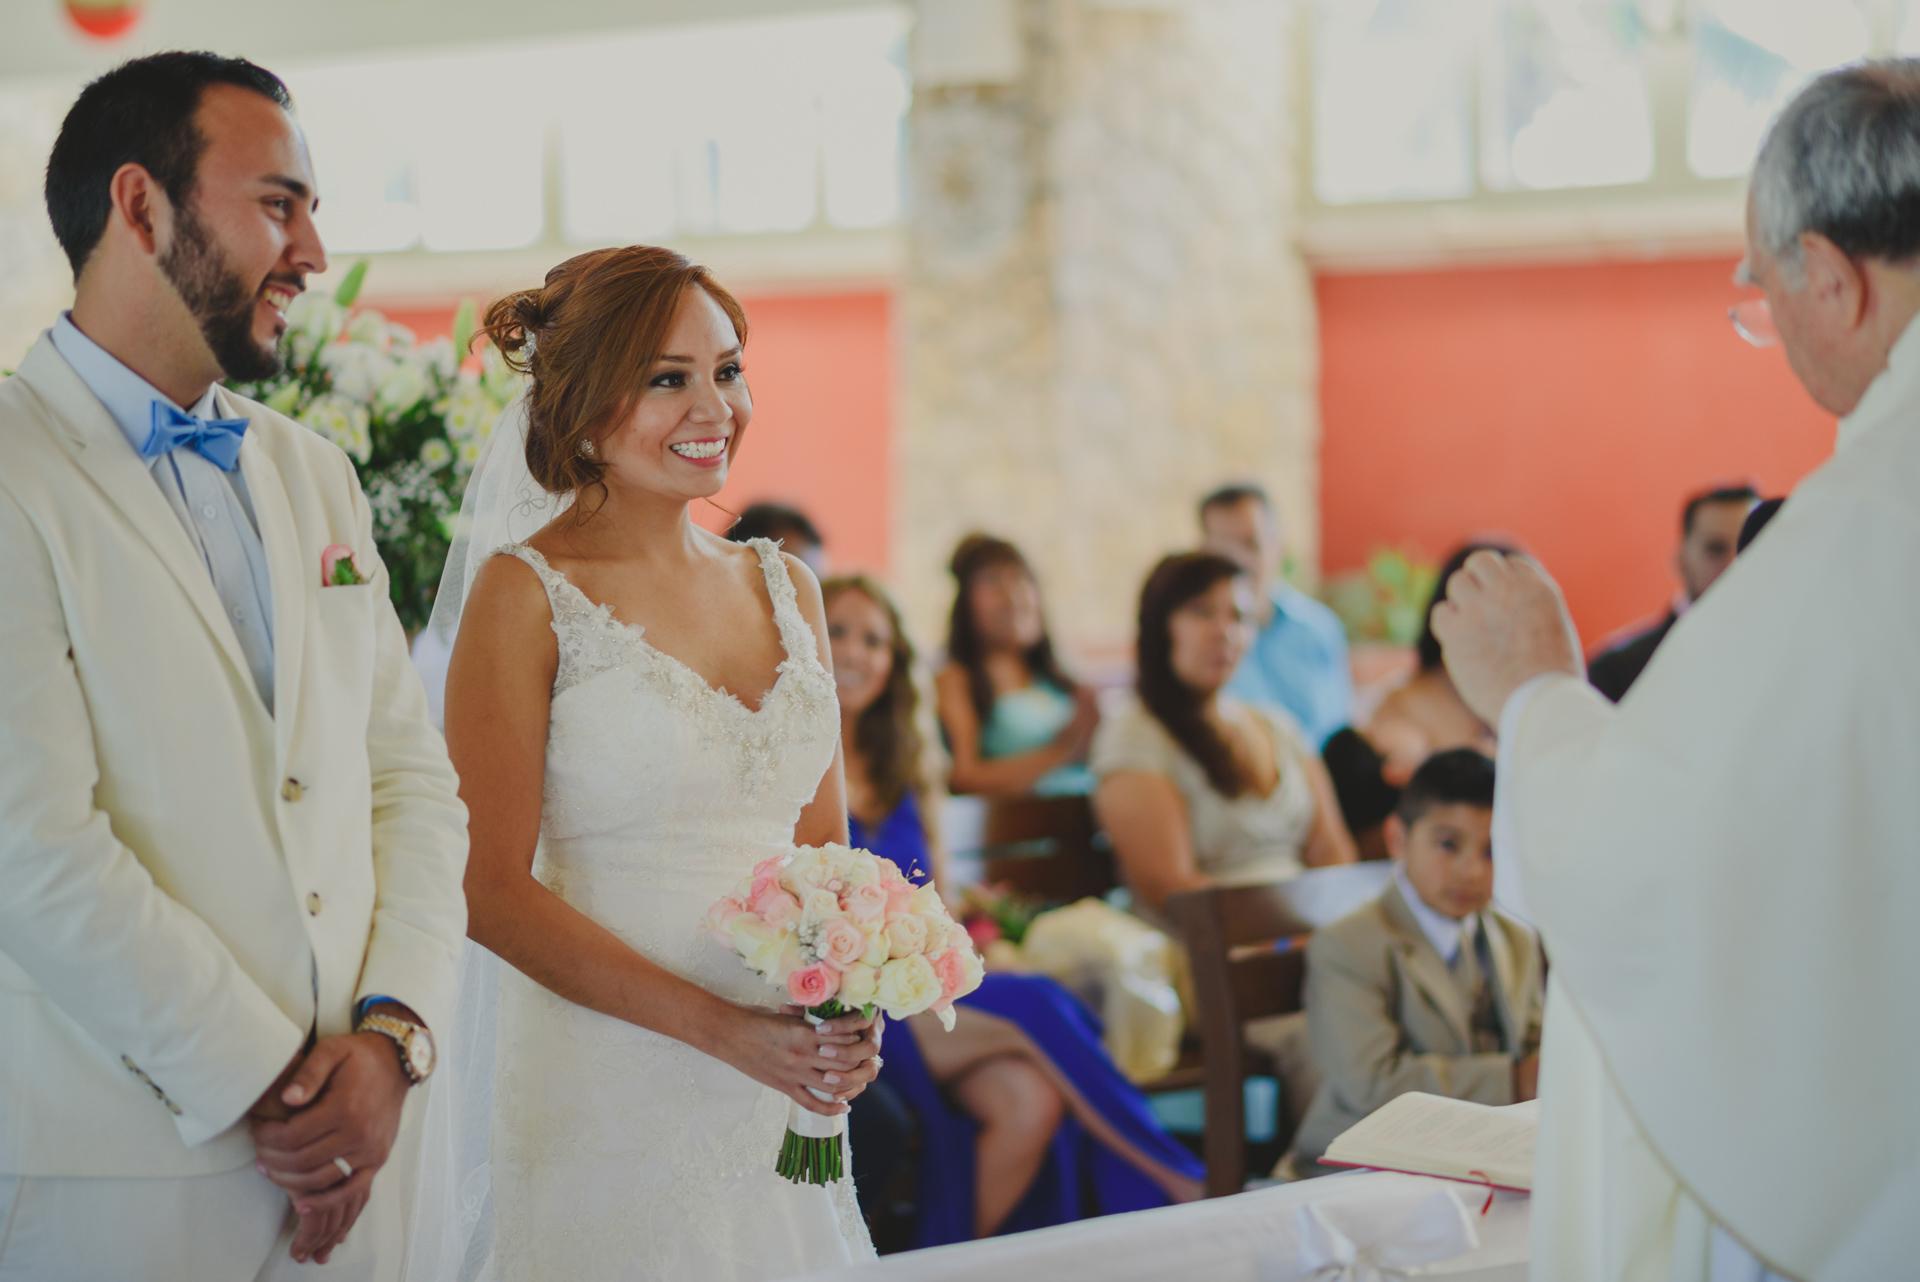 Wedding N&M BLOG luishoudin.com (51 de 174)